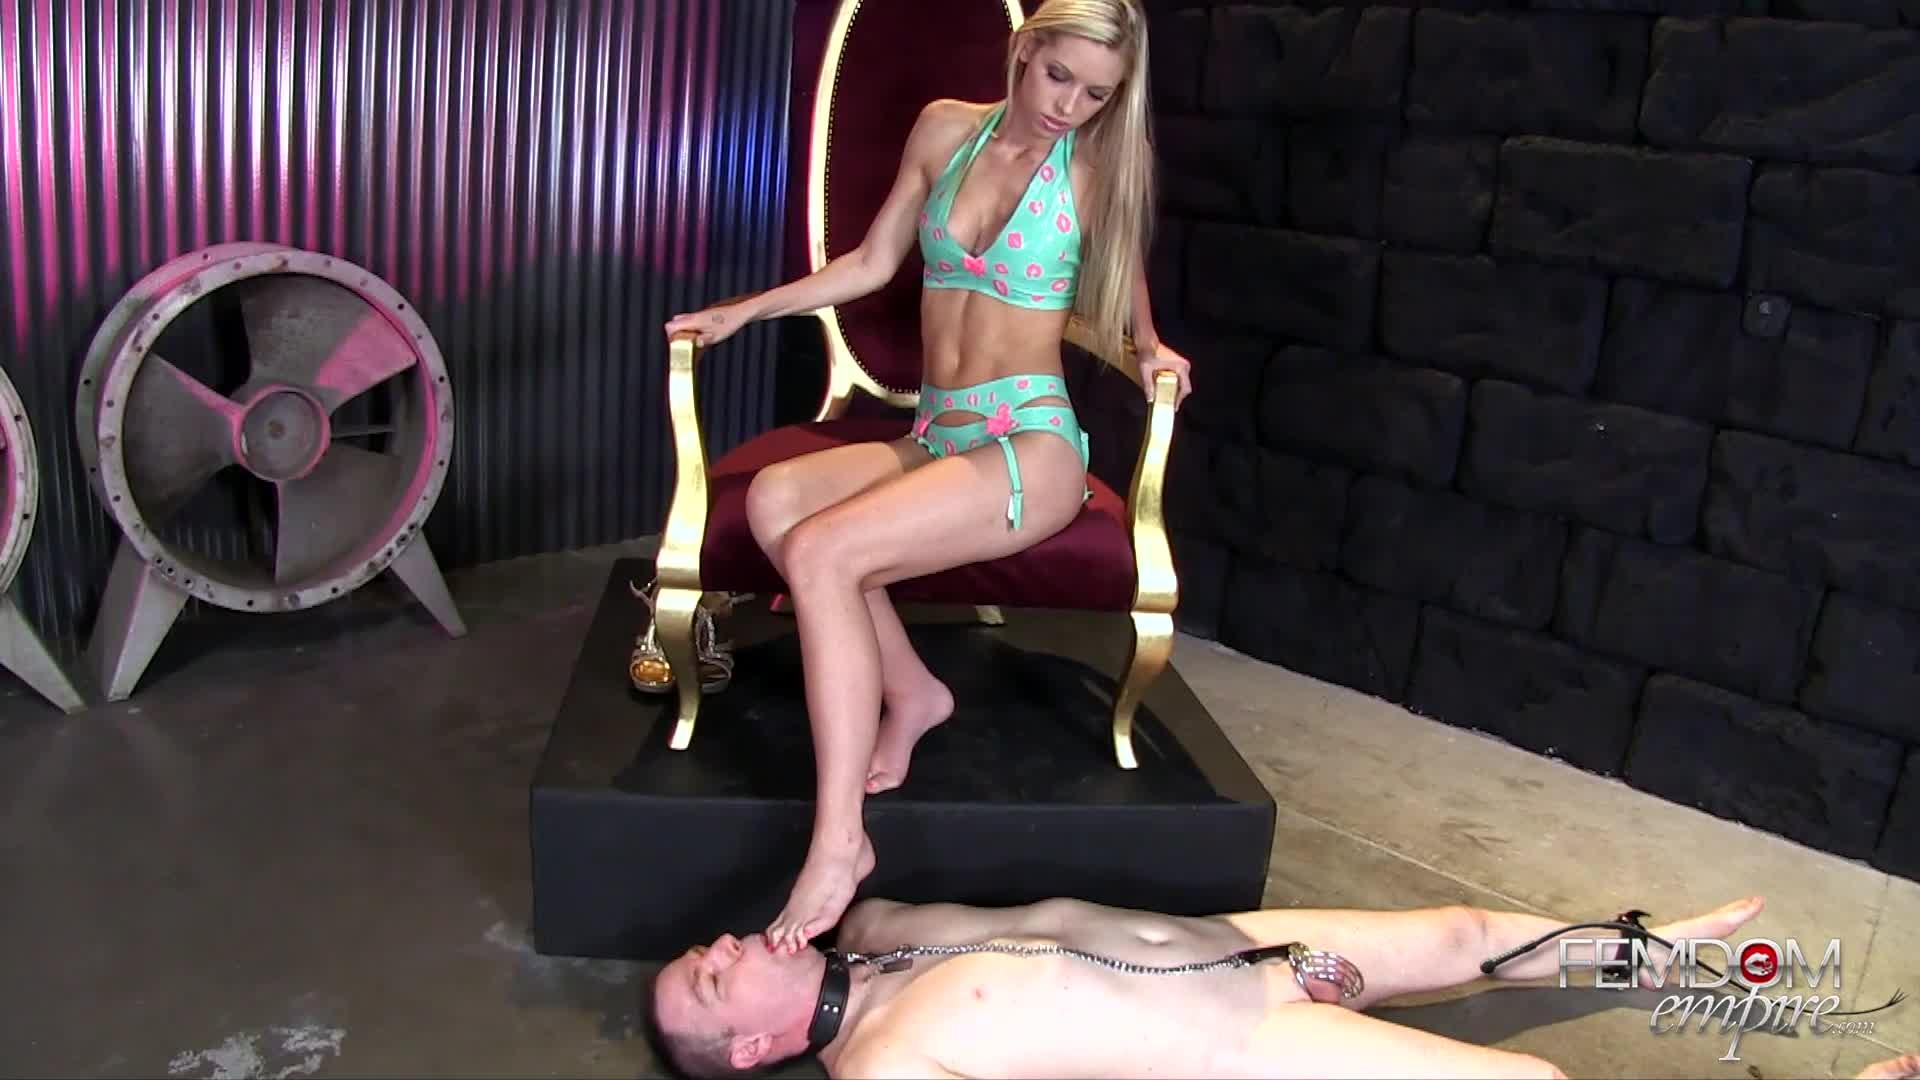 1446760841_femdomempire-brooke-logan-bitchy-princess-toes.jpg